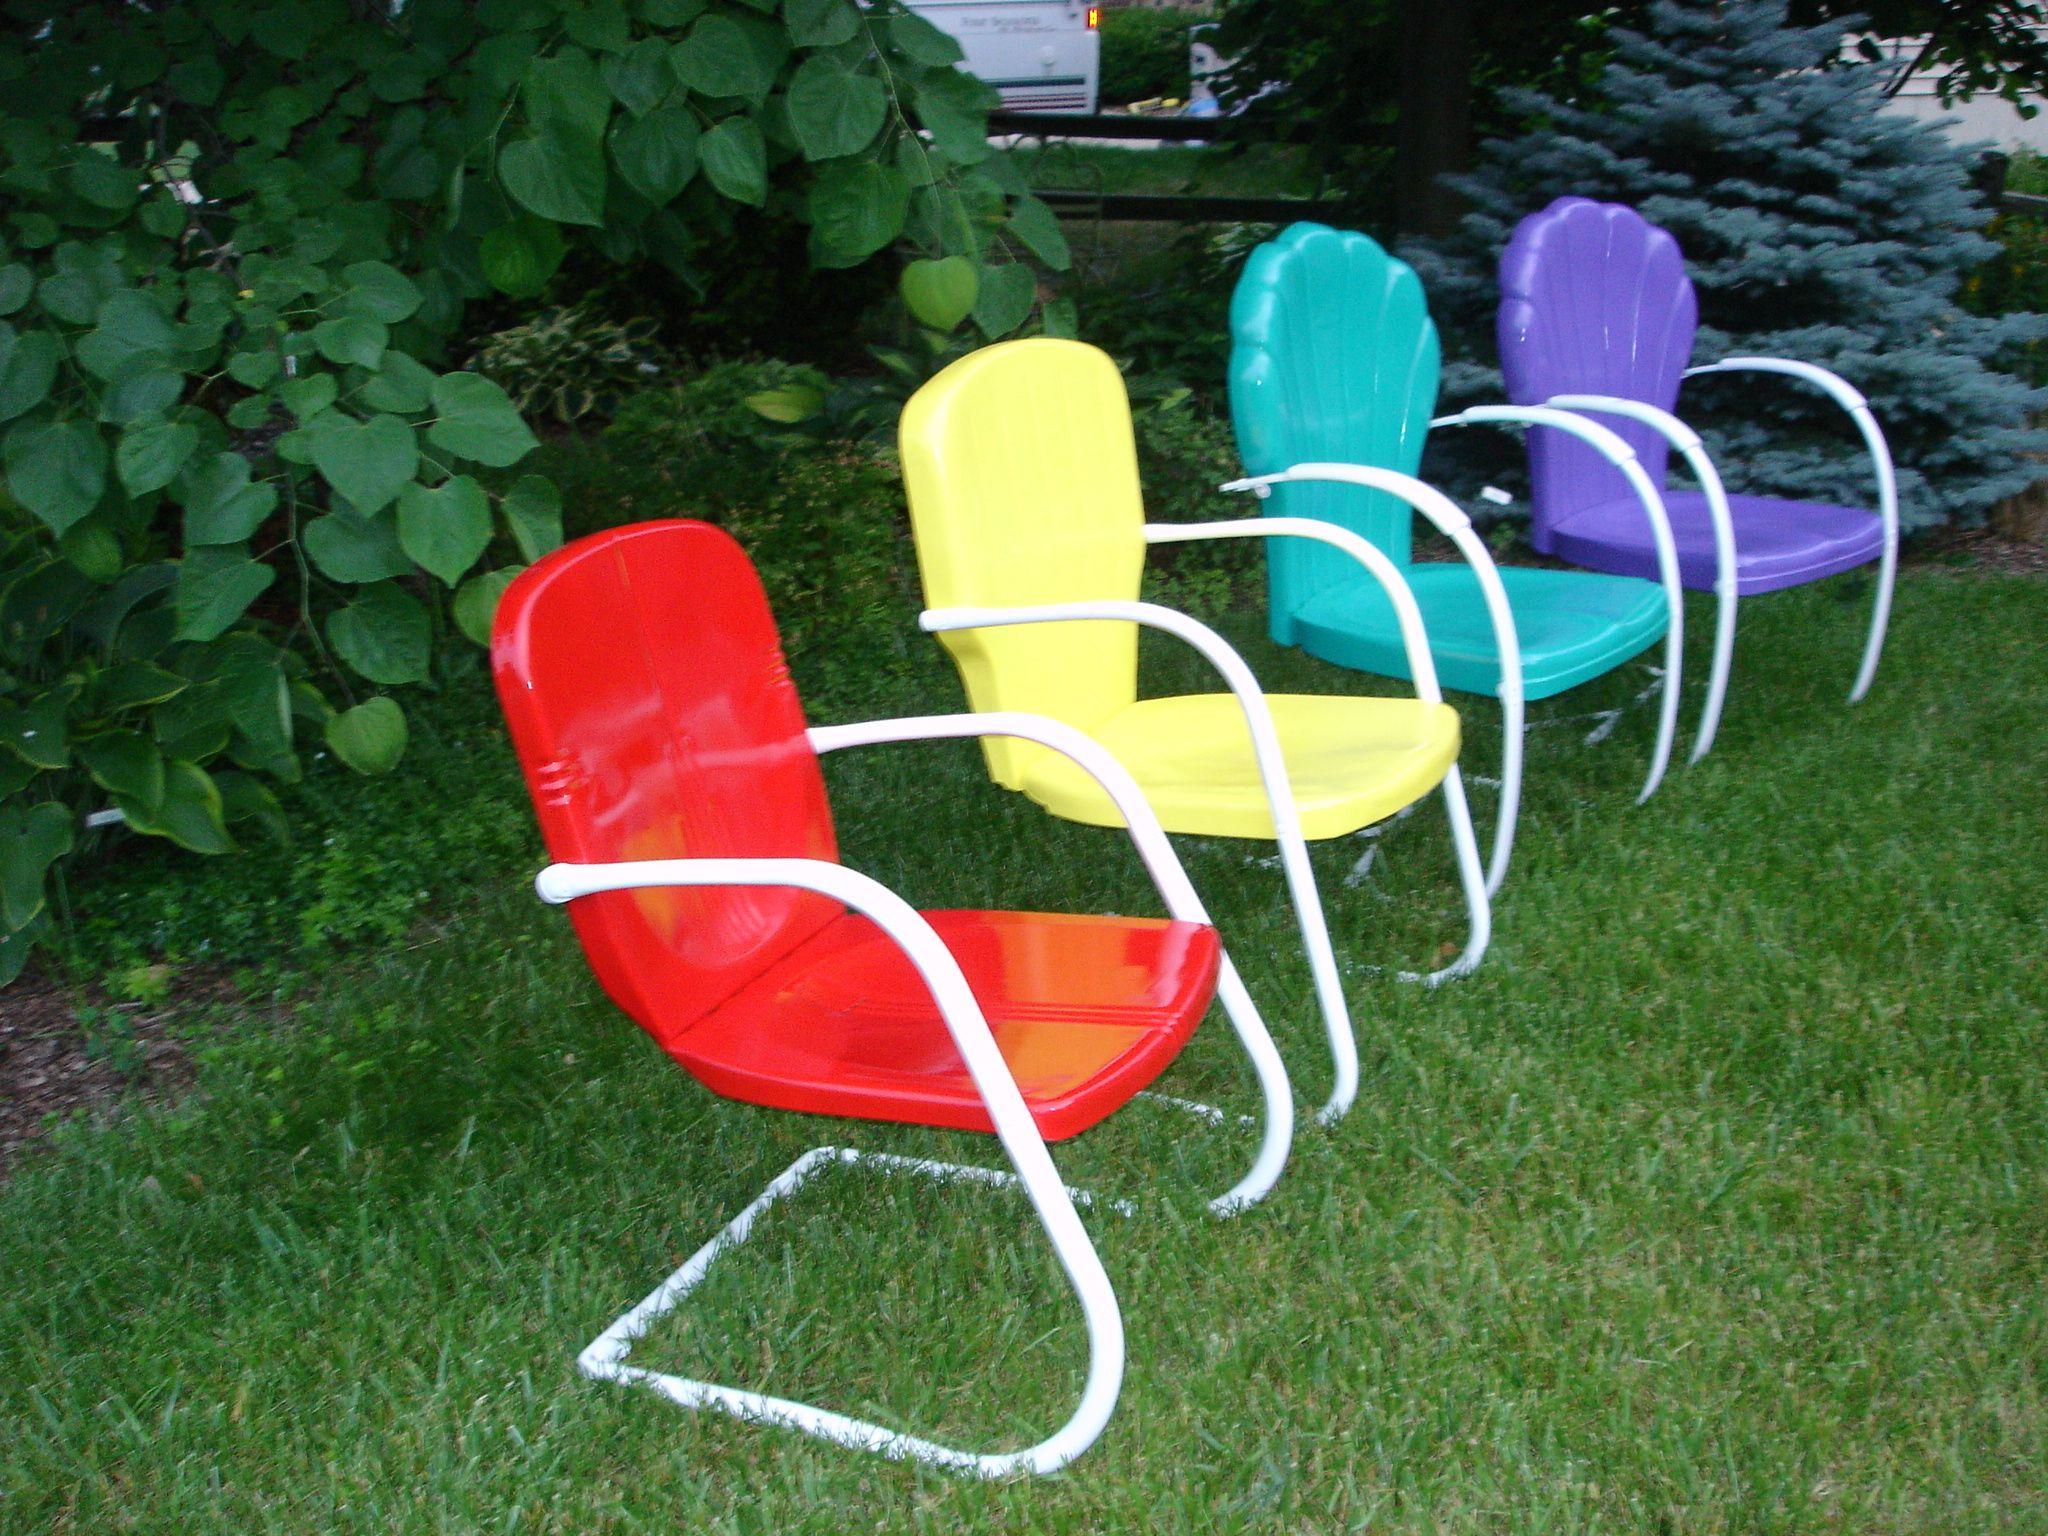 retro metal patio furniture. Fresh Paint, Vintage Metal Lawn Chairs Retro Patio Furniture T